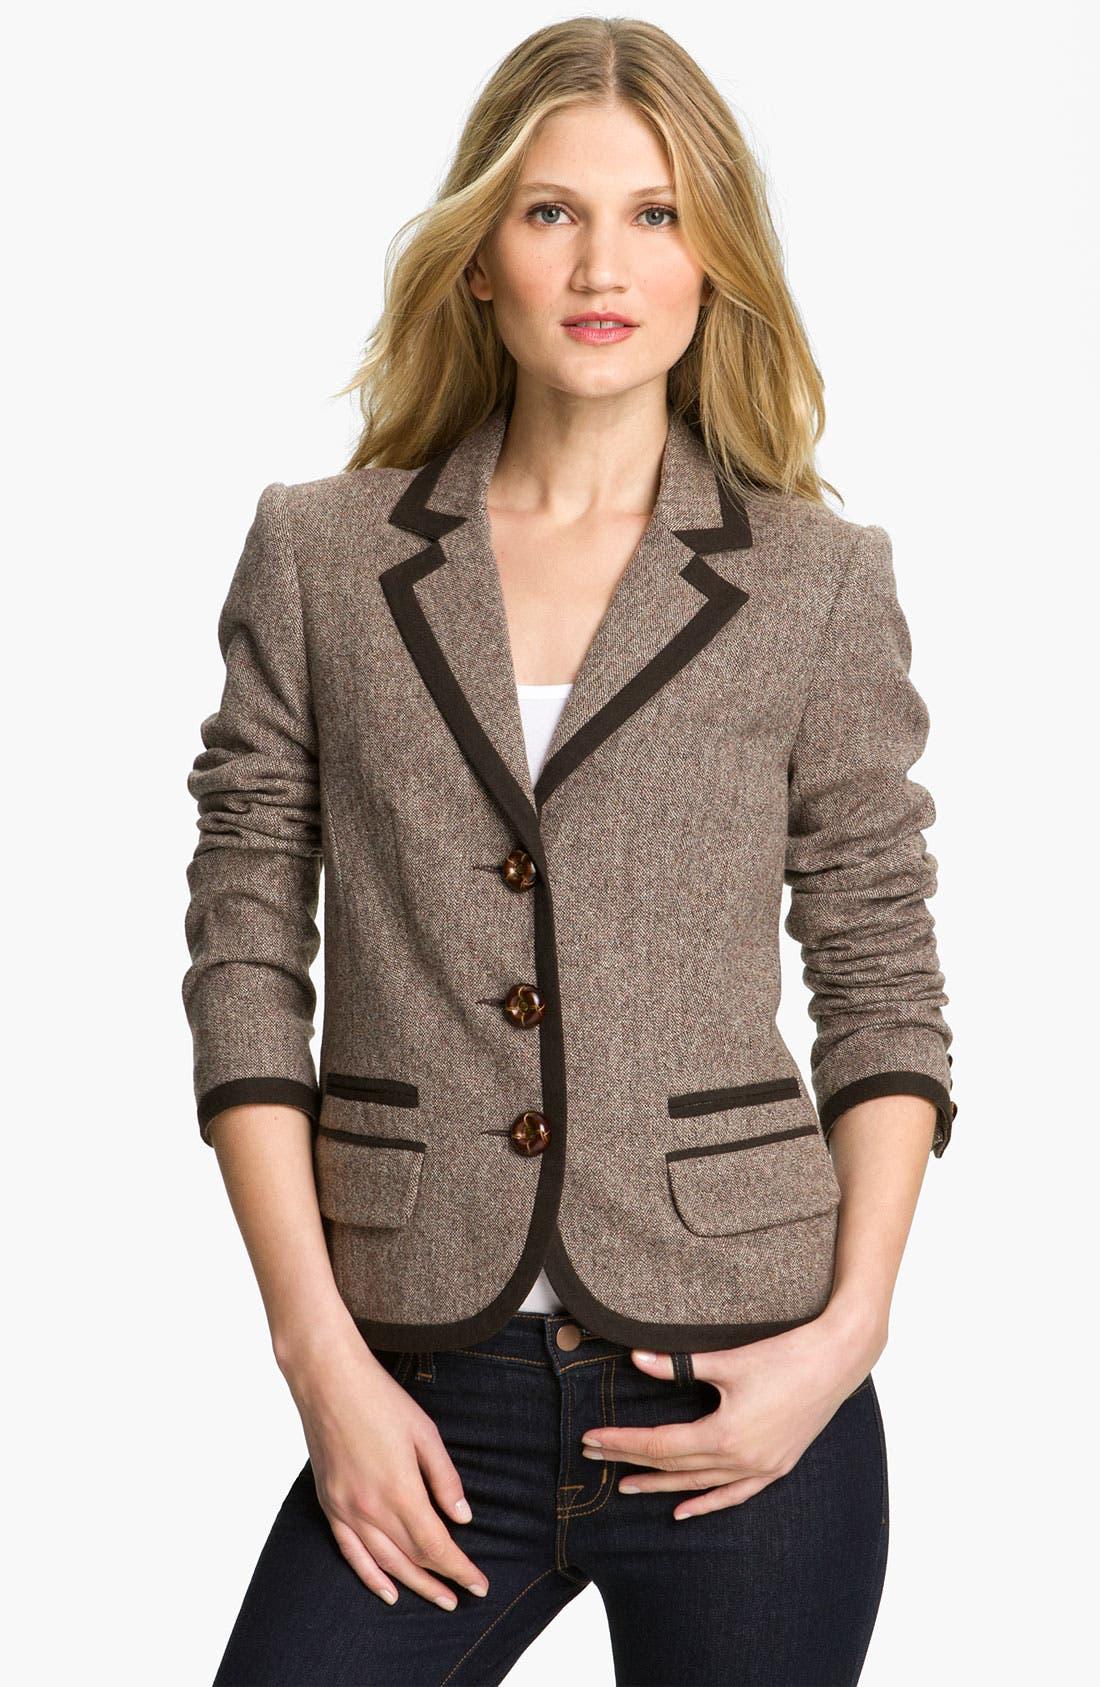 Alternate Image 1 Selected - Trina Turk 'Henrietta' Jacket